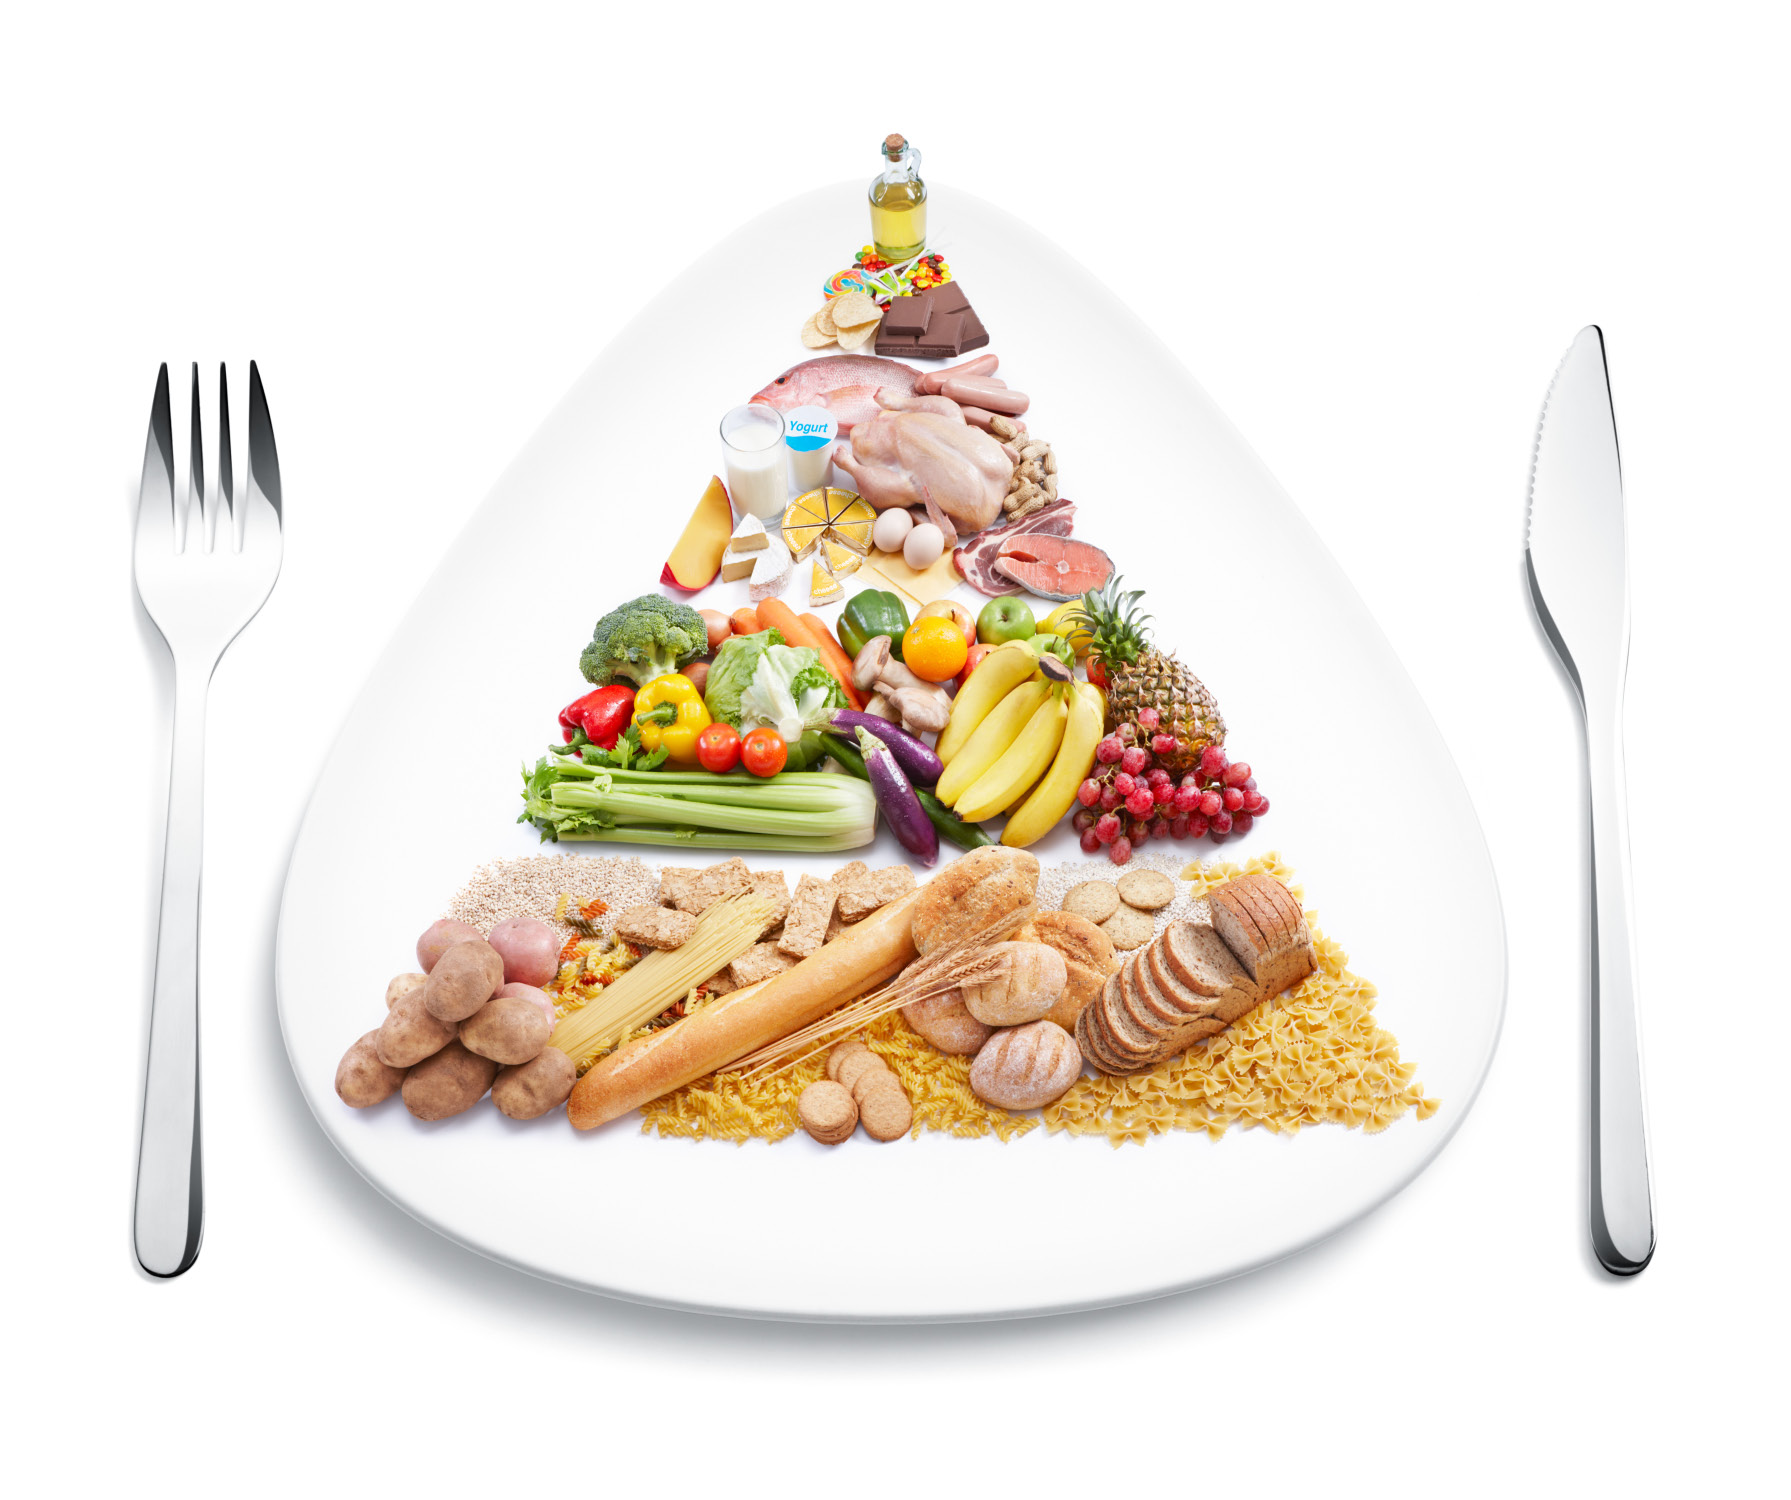 cambio_dieta_opt.jpeg